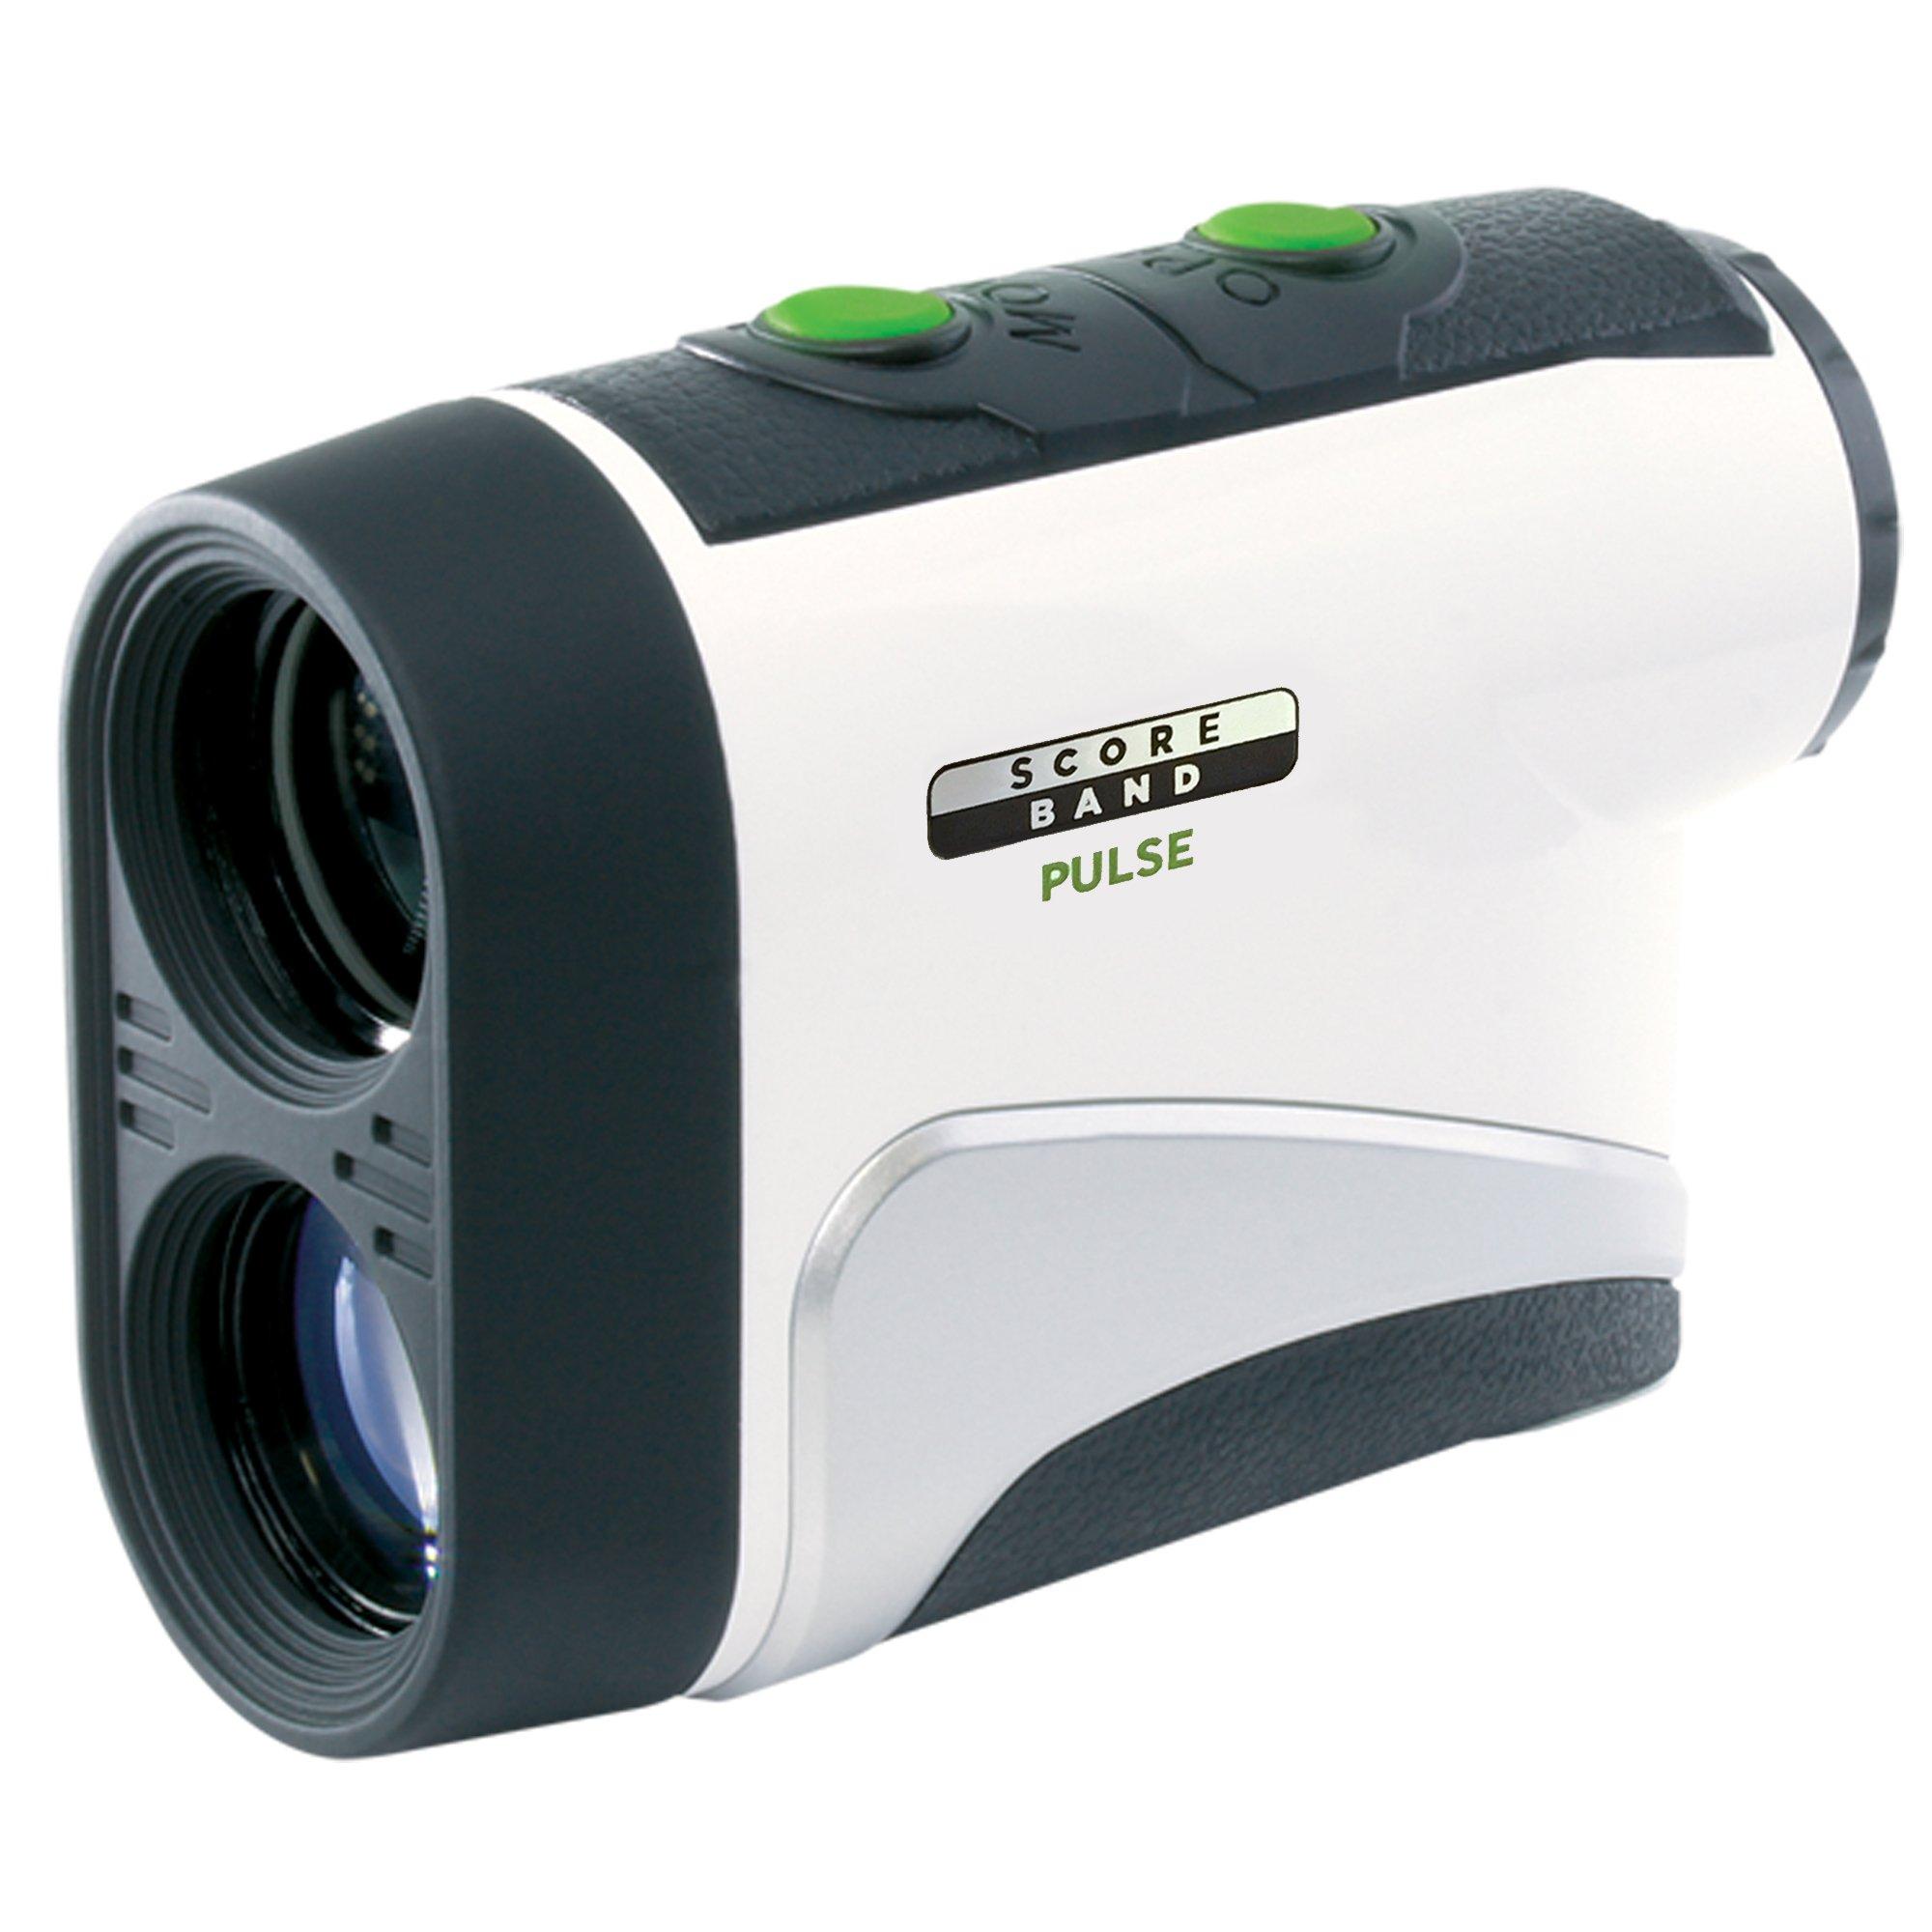 ScoreBand PULSE Compact Laser Rangefinder for Golf, White